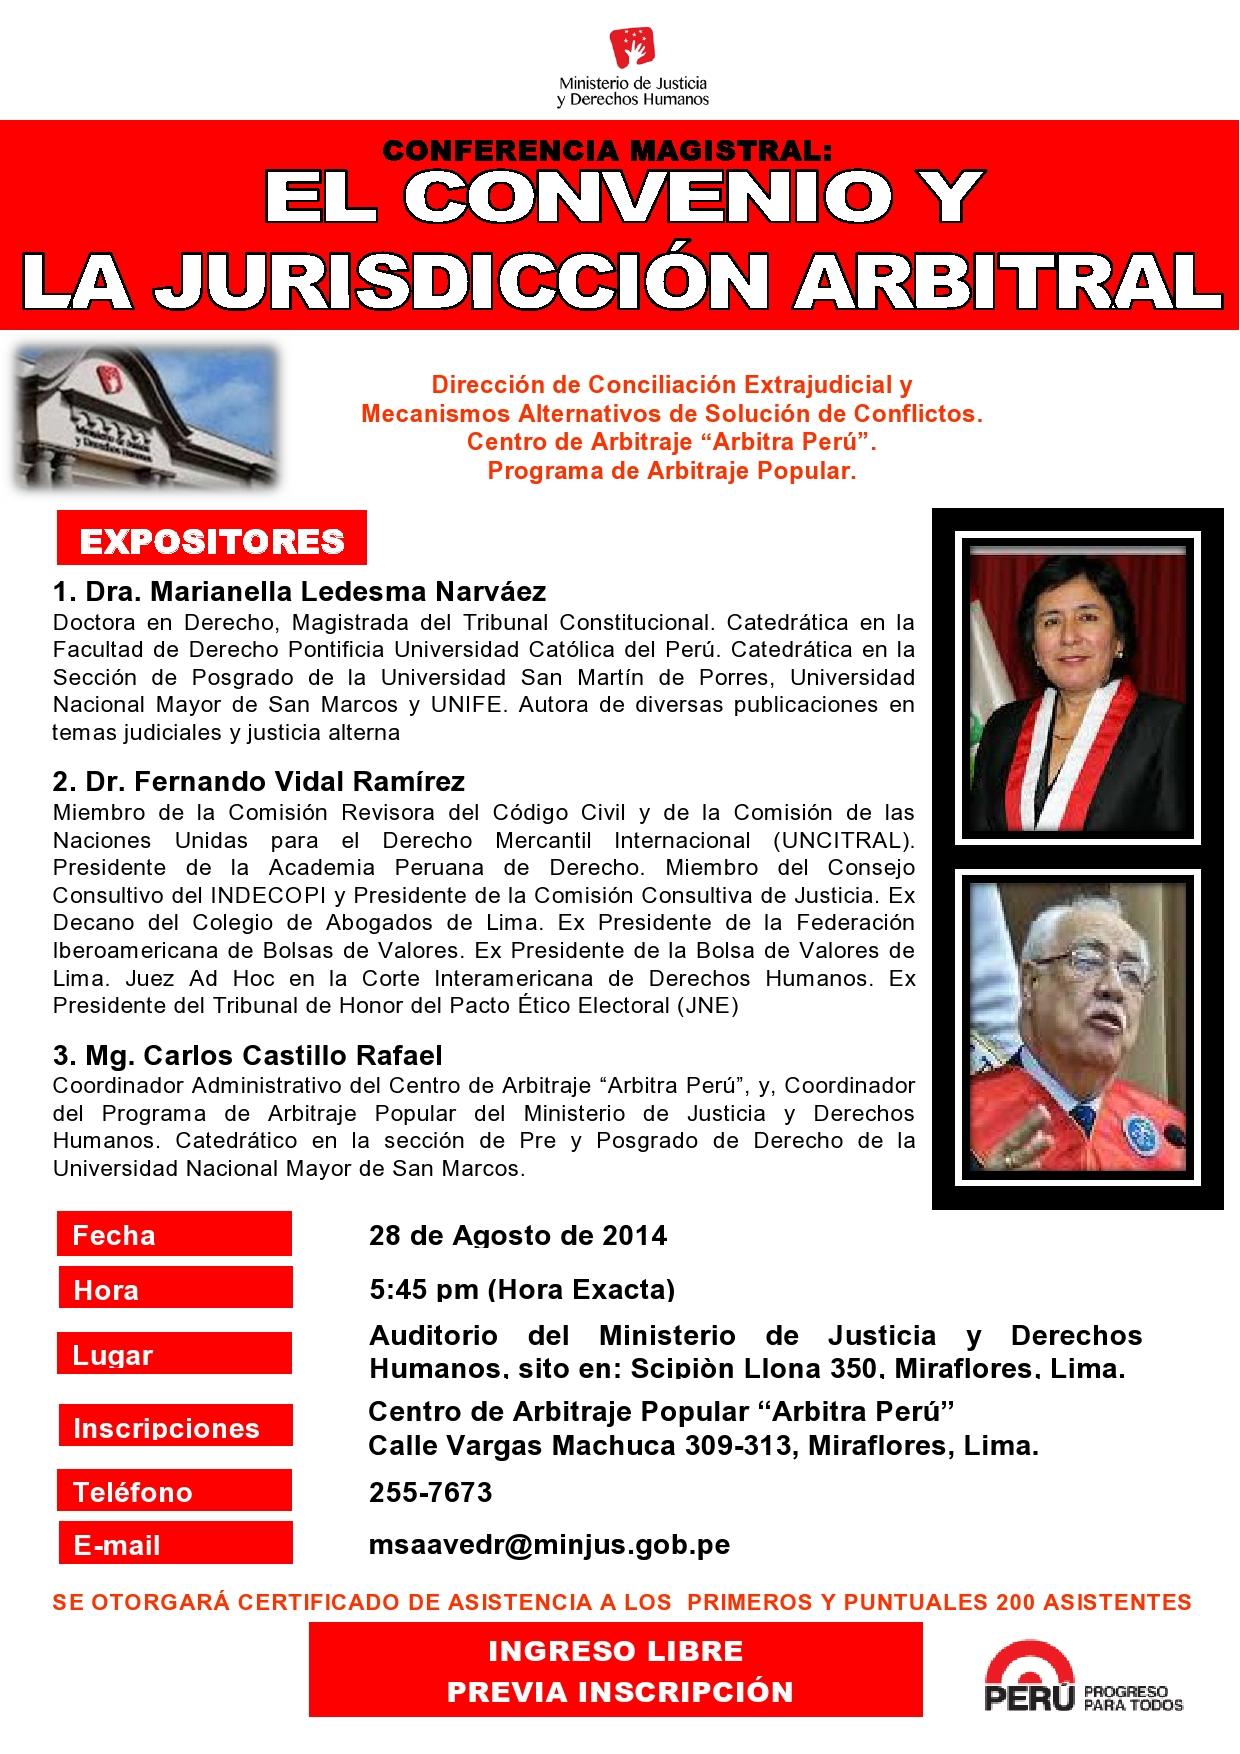 20140830-banner_28_de_agosto_de_2014-conferencia_magistral_de_dos_juristas__-1-.jpg